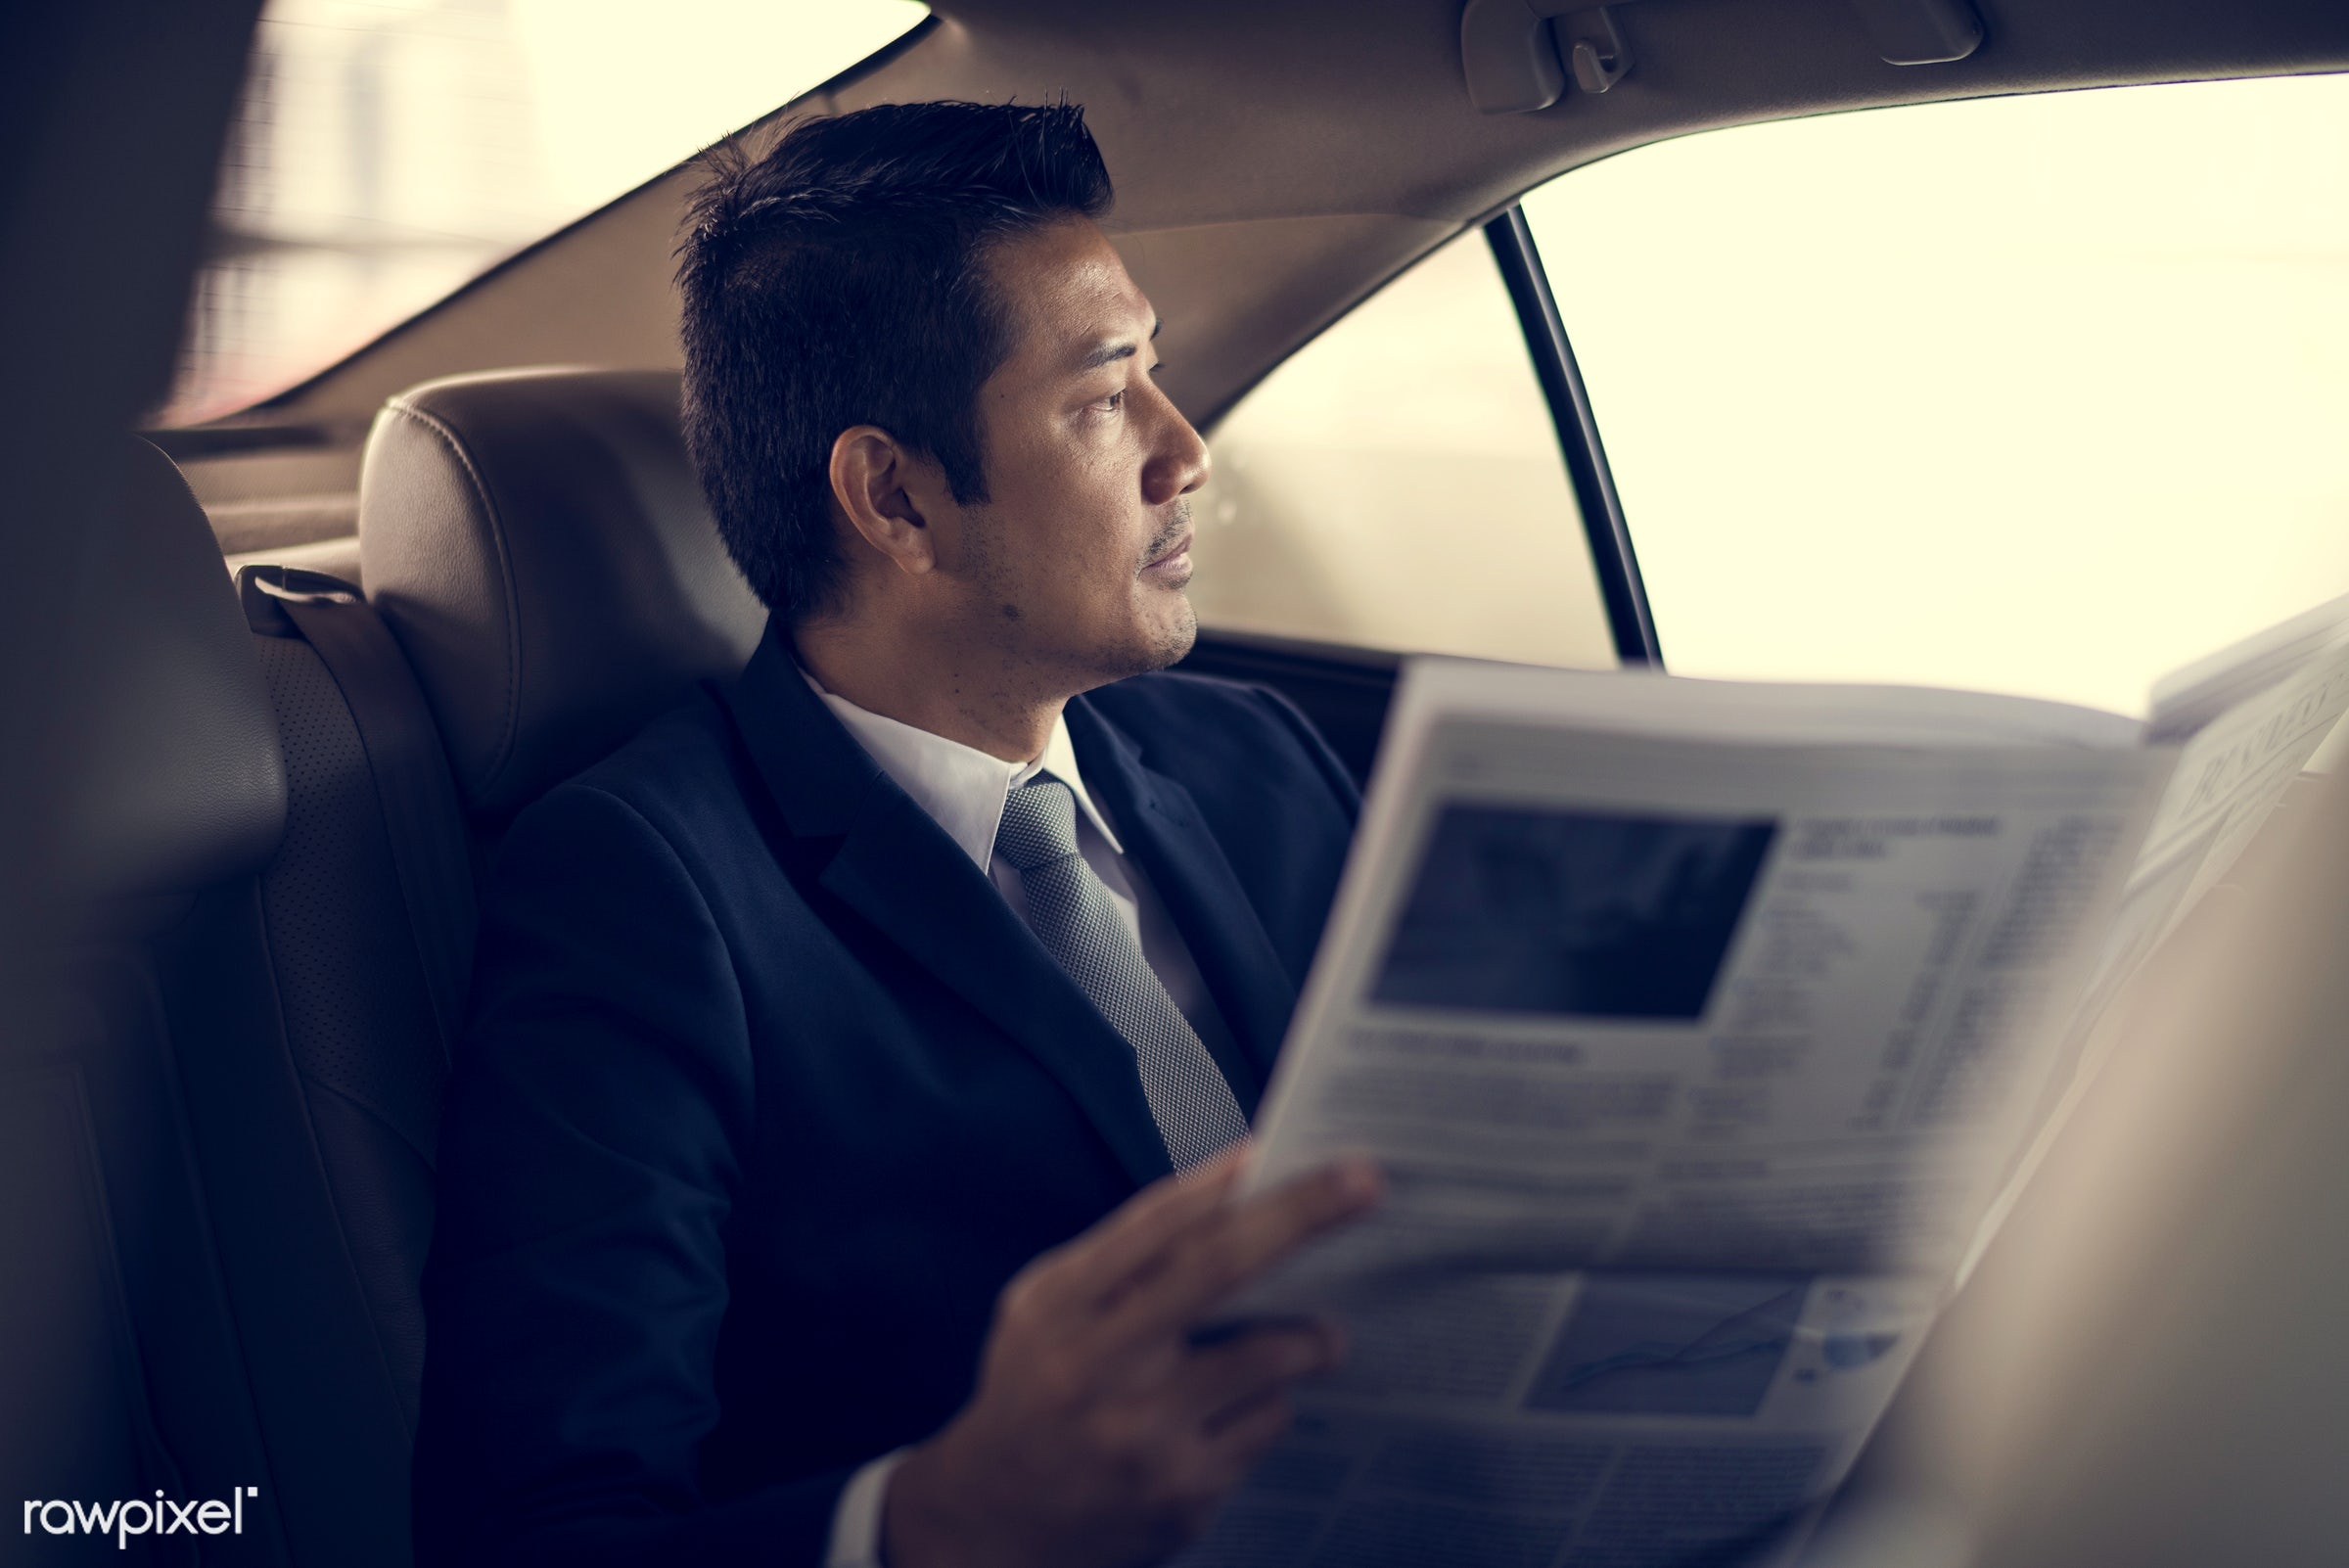 adult, back seat, break, breaking news, business, businessman, businessmen, candid, car, communication, corporate, employee...